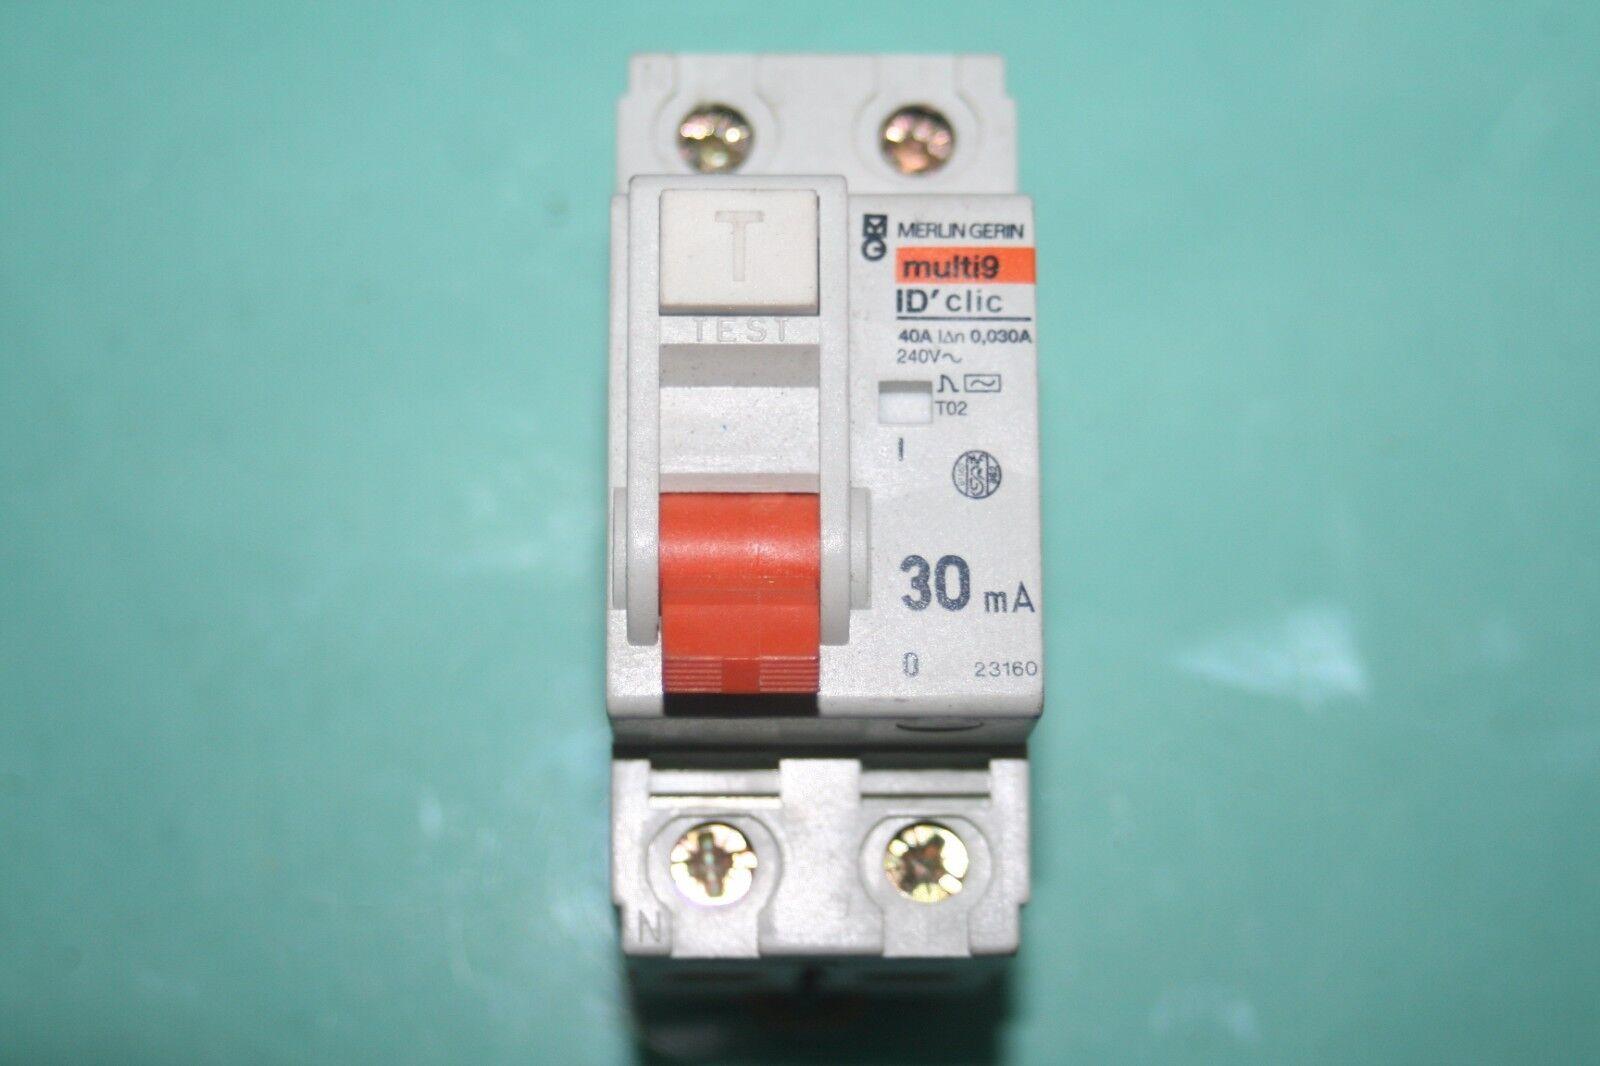 6x Schneider 23158 ID /'clic XP 2p 40 A 30ma-a Type A